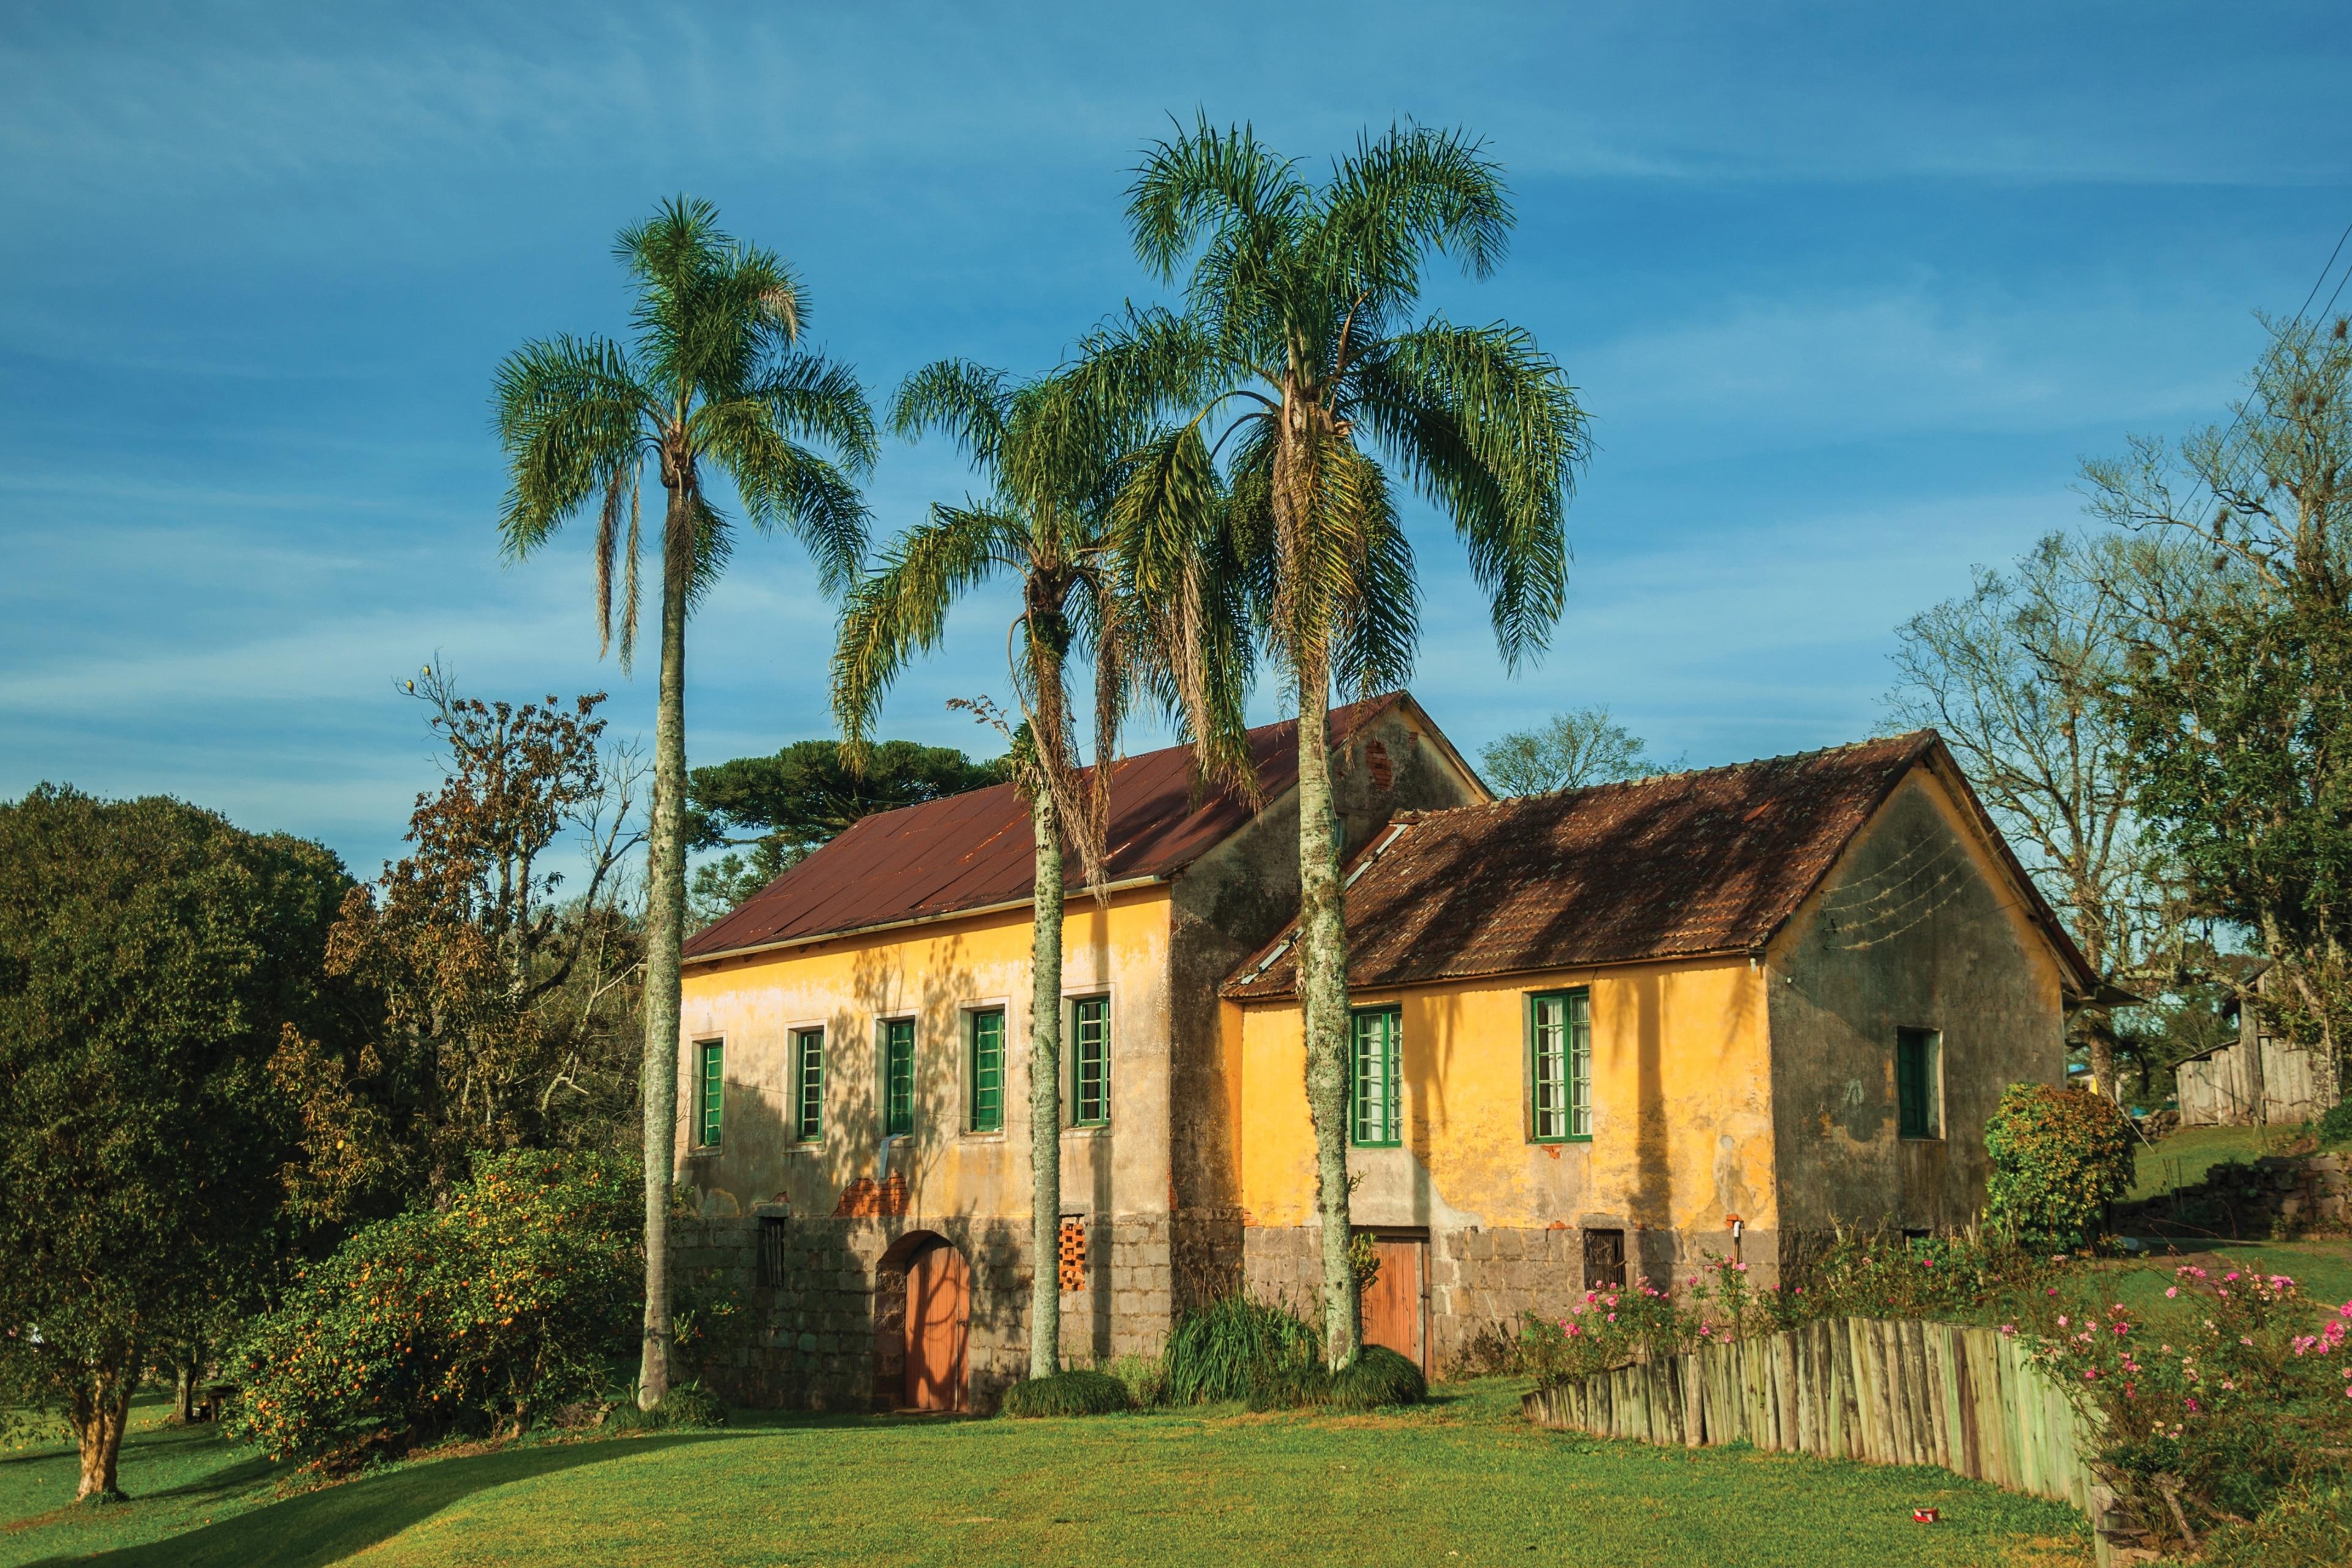 Bento Gonçalves, Rio Grande do Sul (Bundesstaat), Brasilien